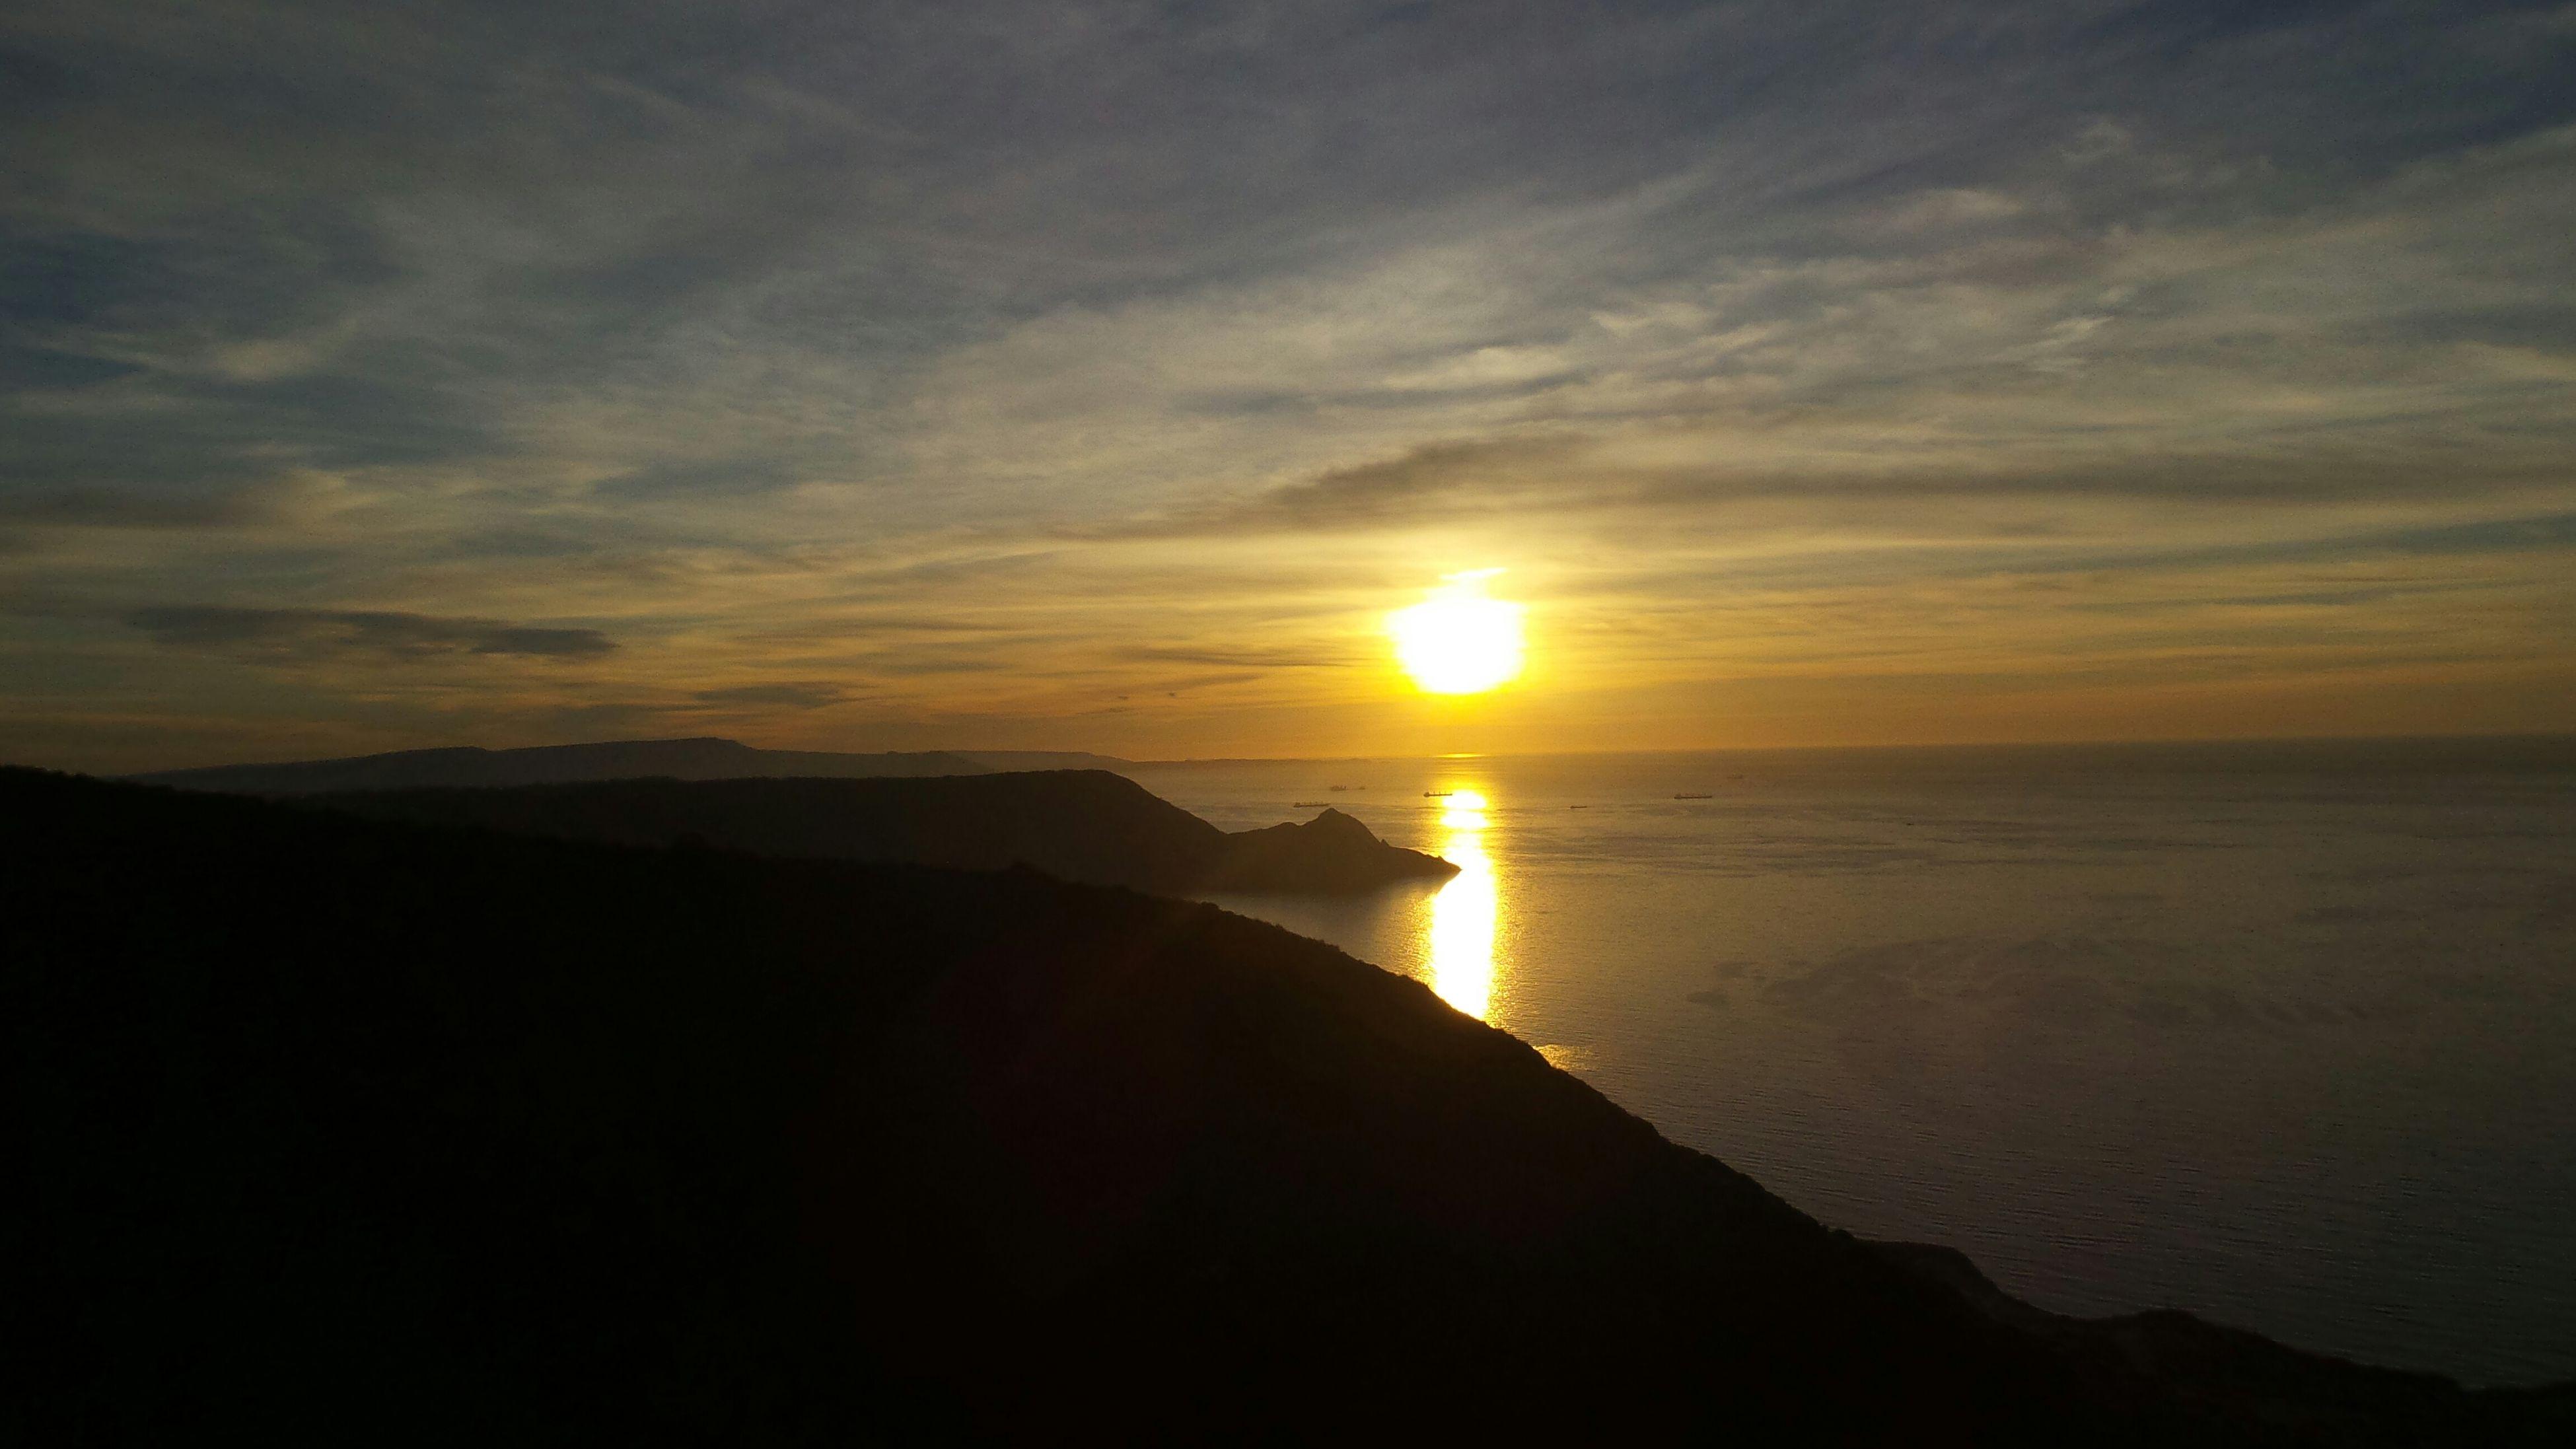 sunset, sea, sun, scenics, sky, tranquil scene, beauty in nature, tranquility, water, horizon over water, silhouette, cloud - sky, idyllic, nature, orange color, beach, mountain, sunlight, cloud, sunbeam